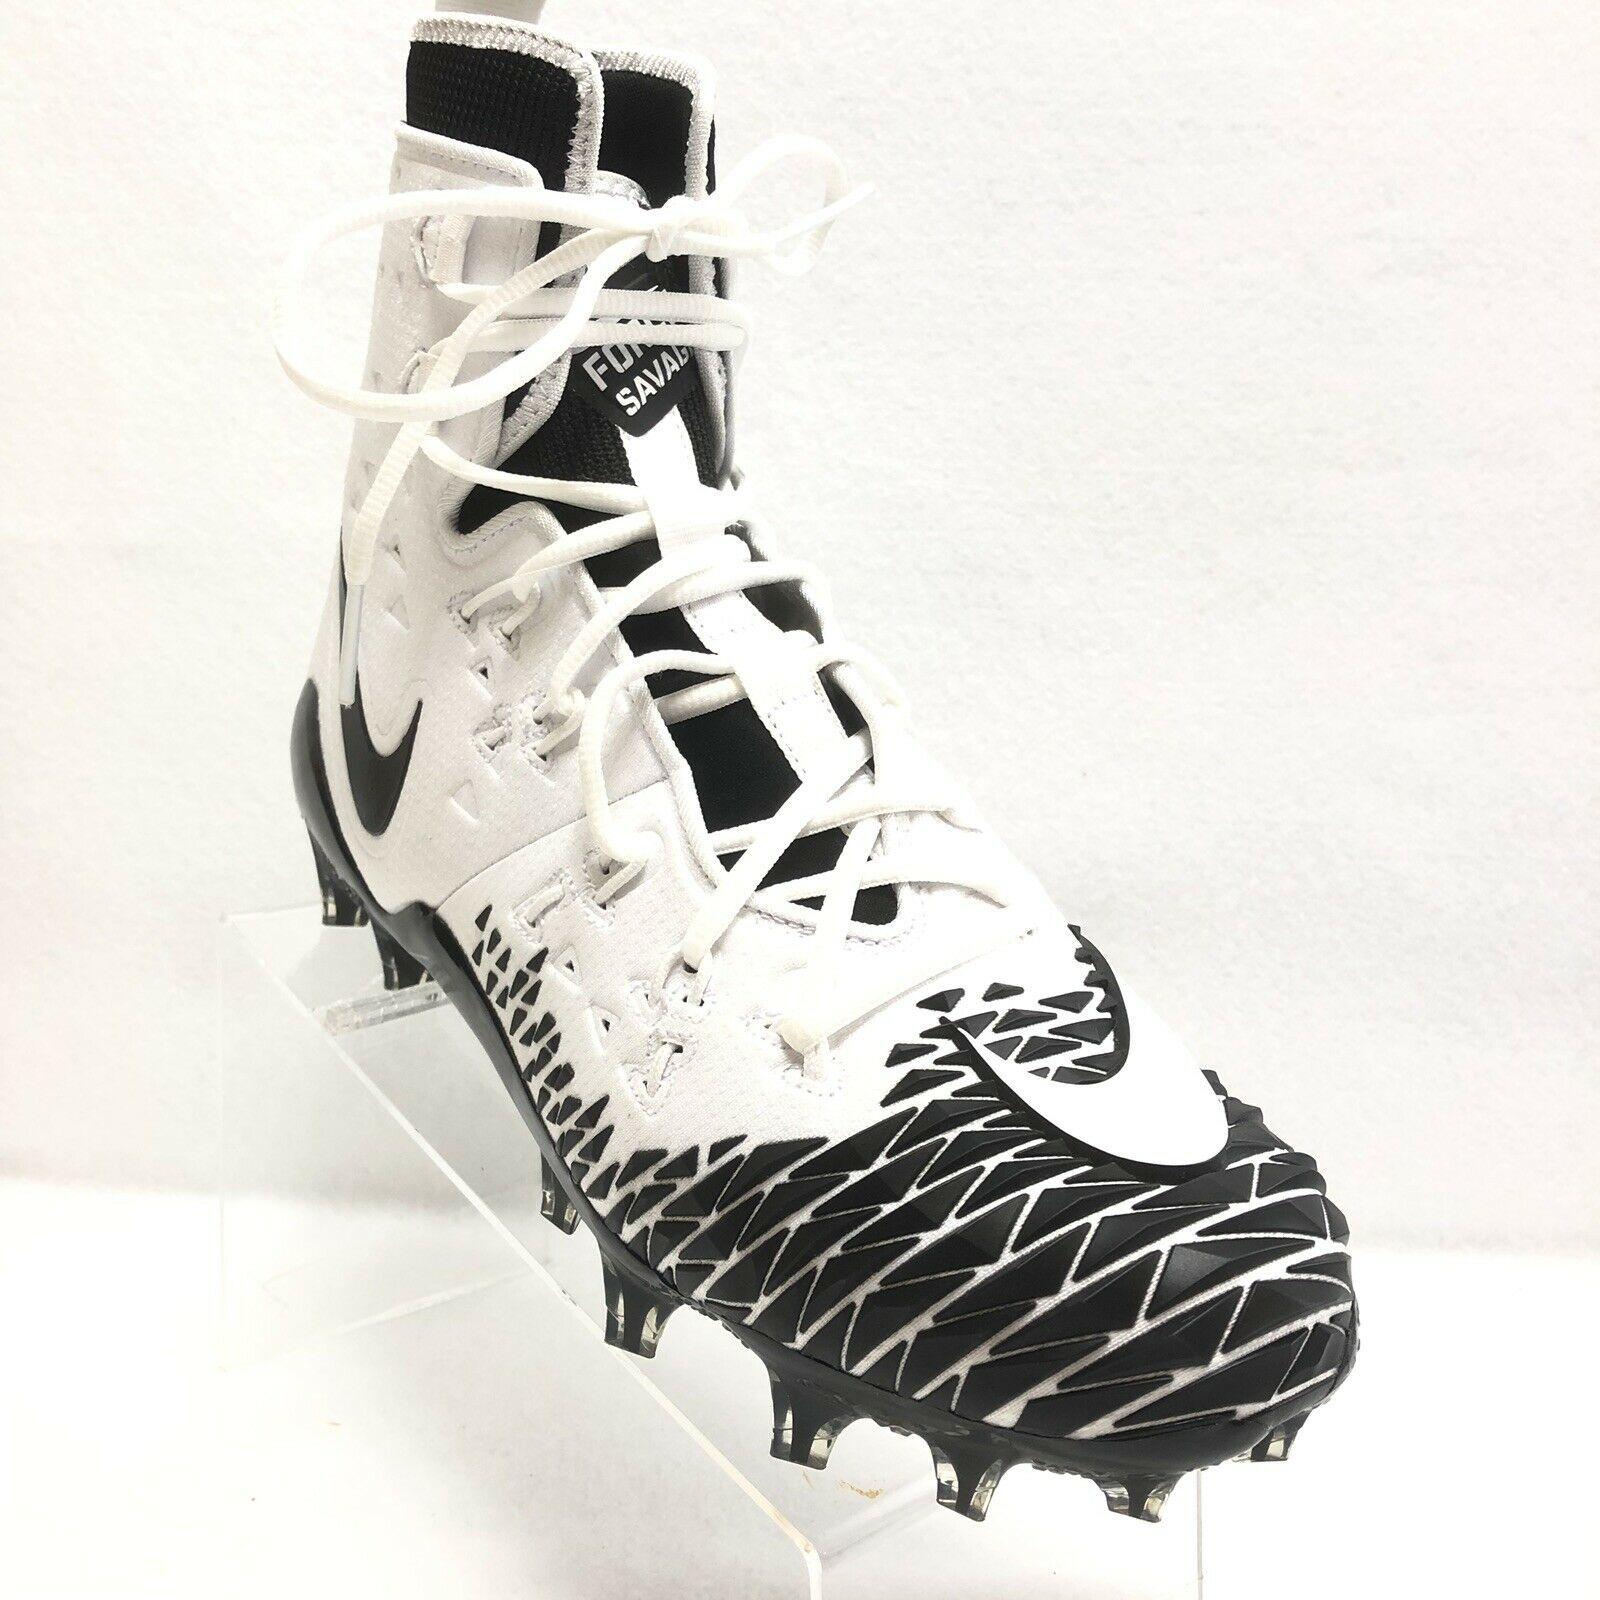 56ebfb850b4 Nike Force Savage Men s Hi-Top Football and 50 similar items. 57